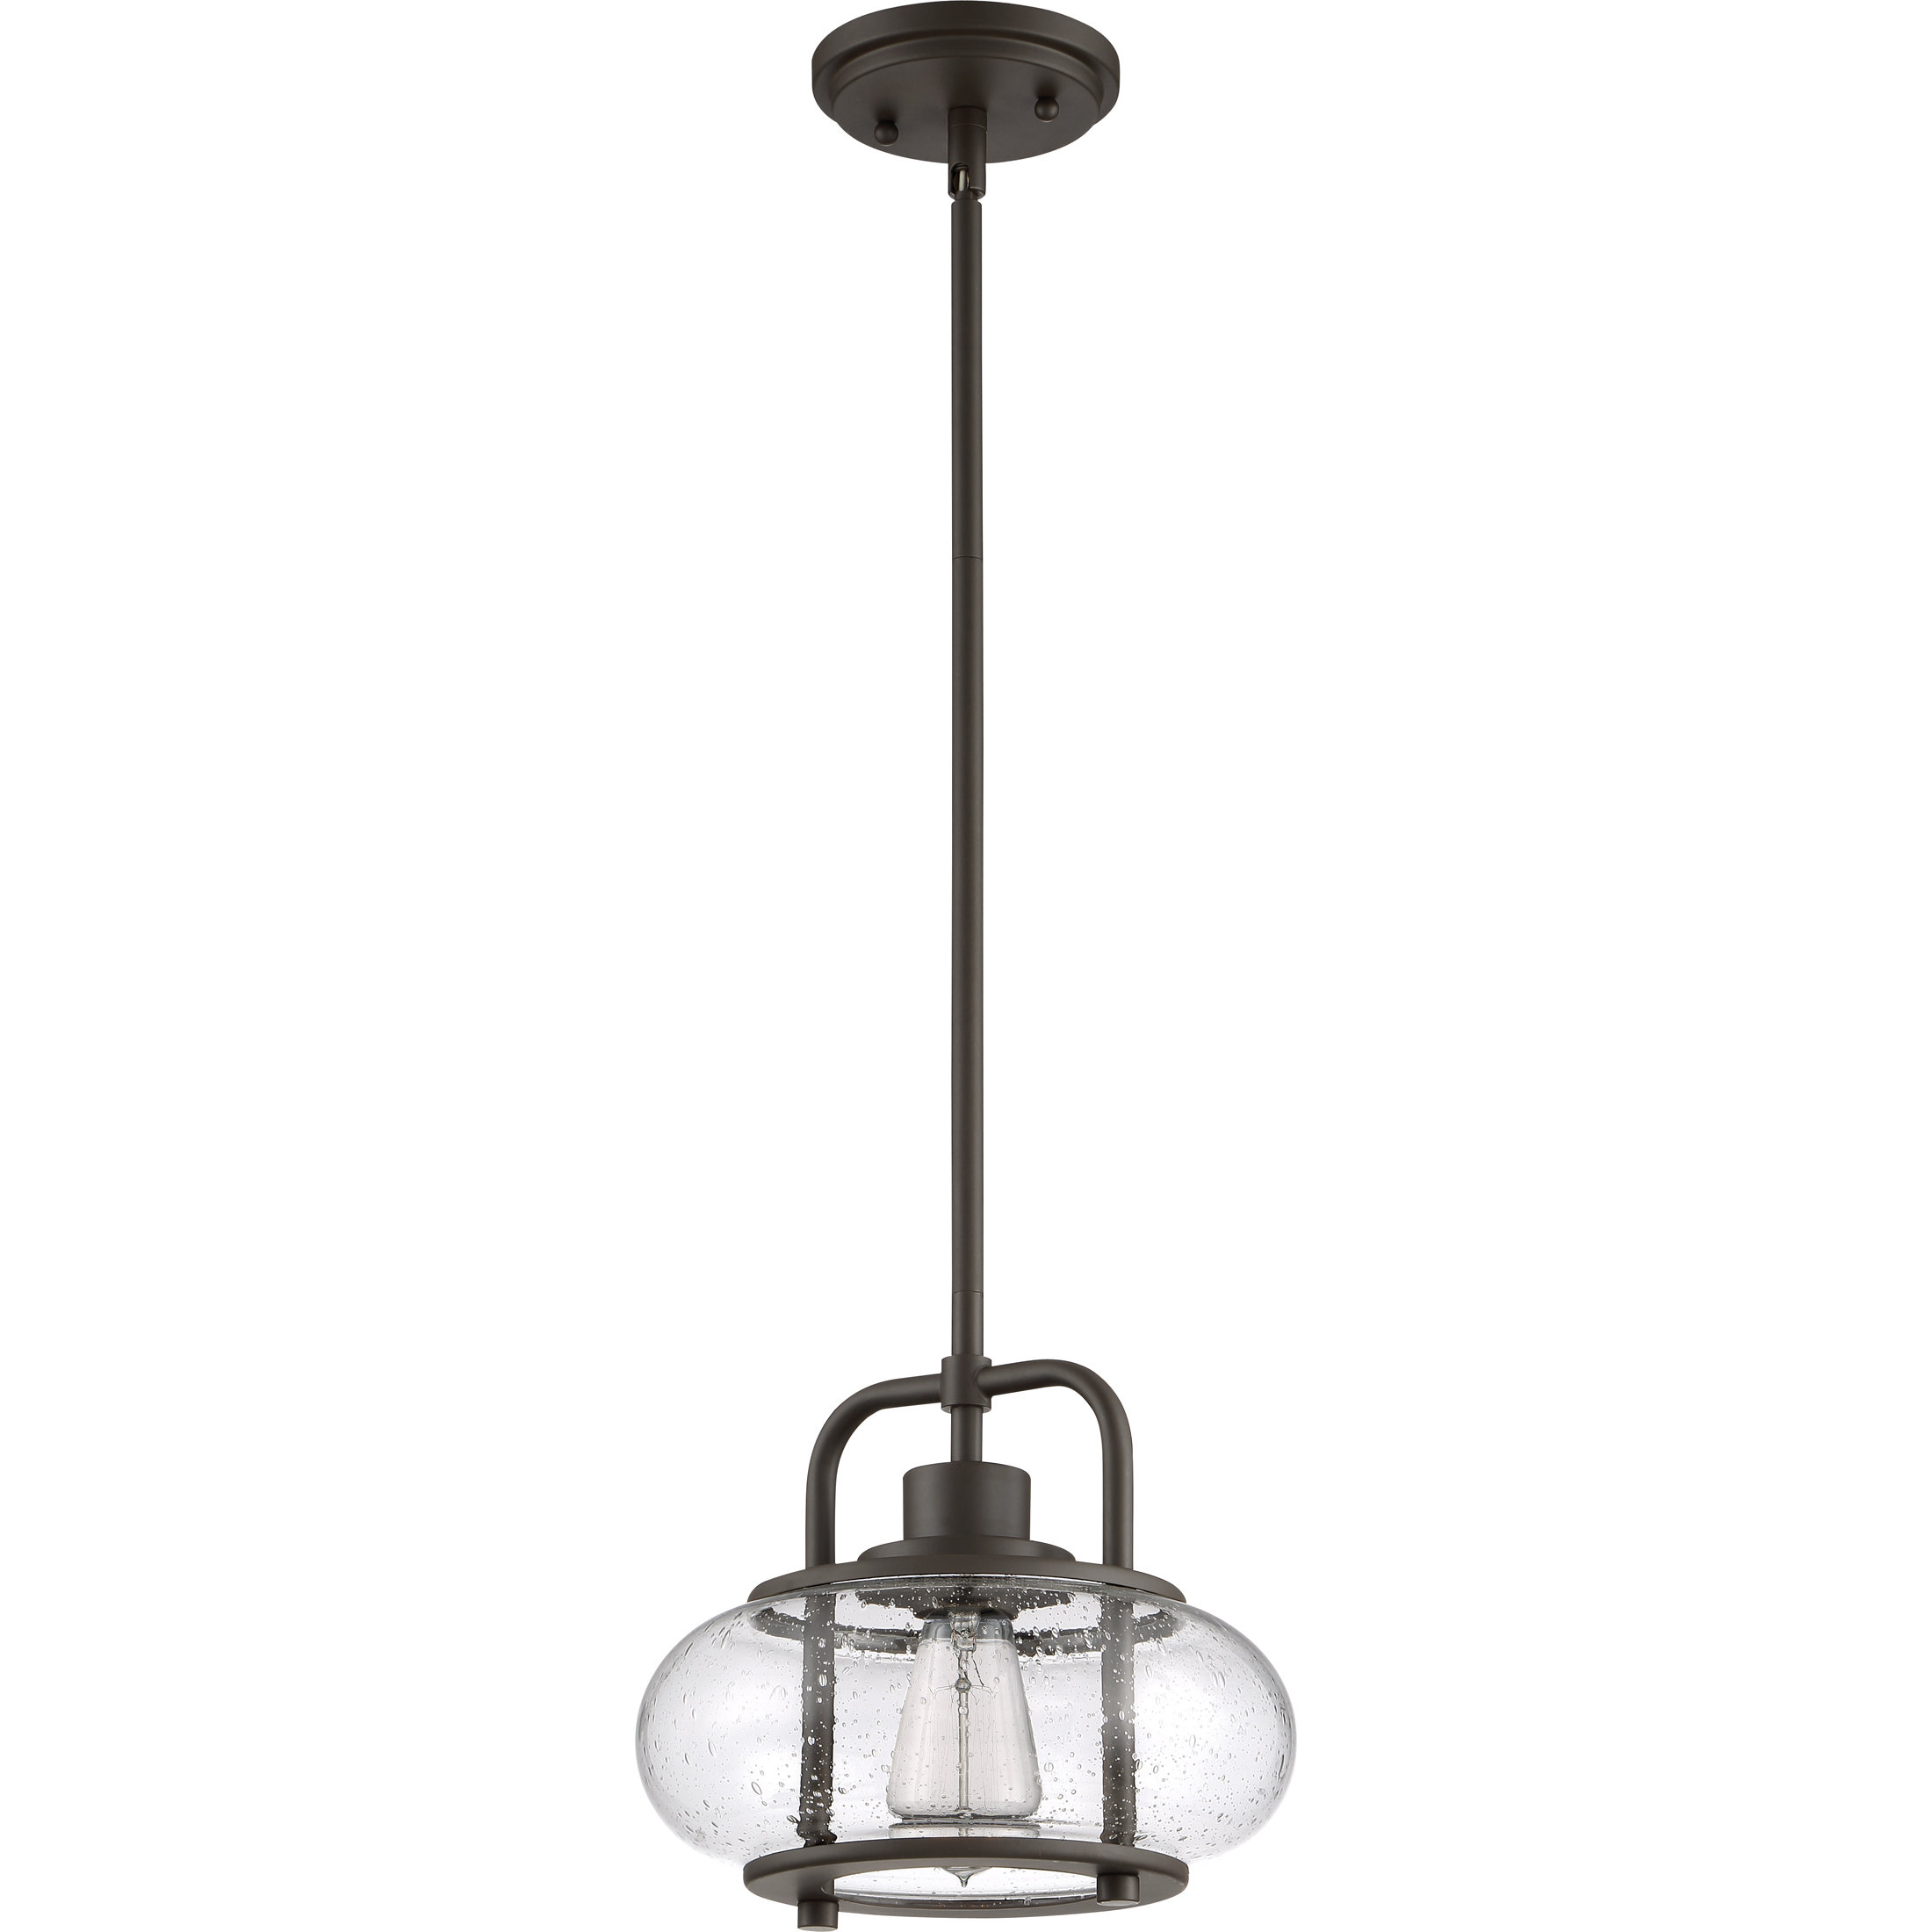 Current Braxton 1 Light Single Schoolhouse Pendant Pertaining To Terry 1 Light Single Bell Pendants (View 4 of 25)